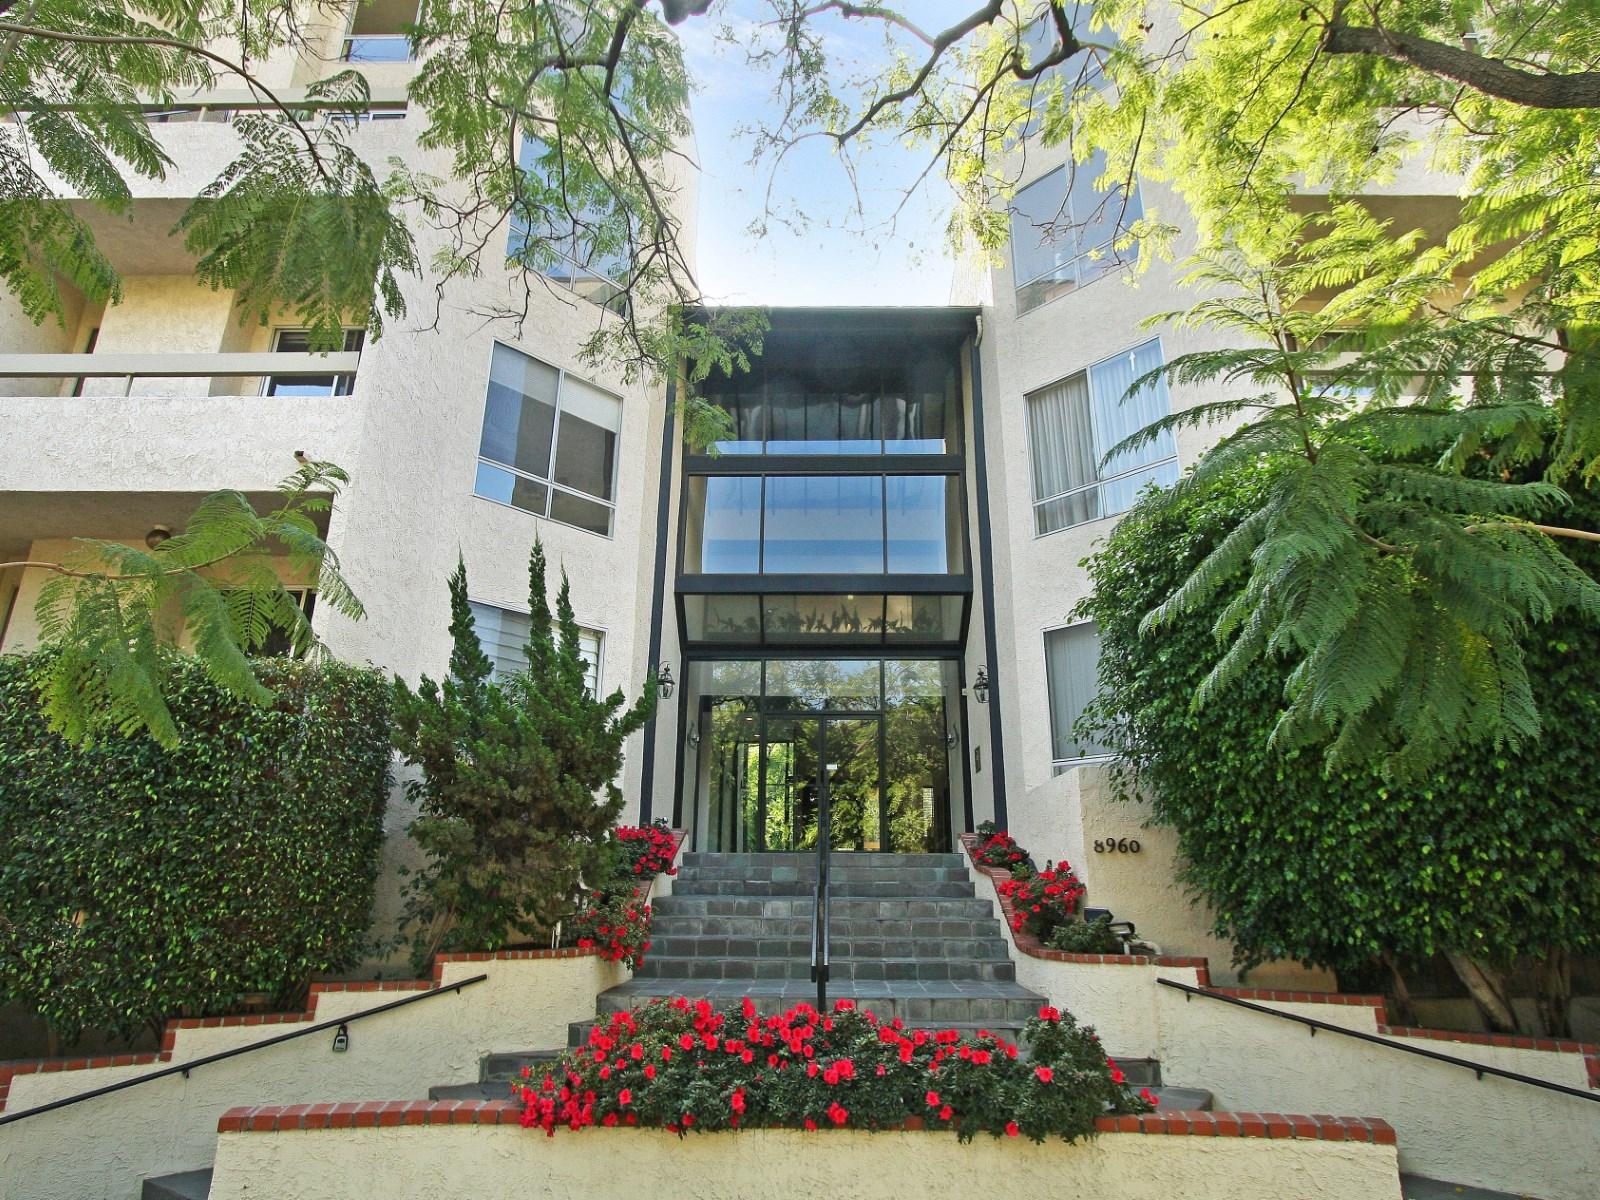 WestHollywood-1BD1BA-499,000.jpg